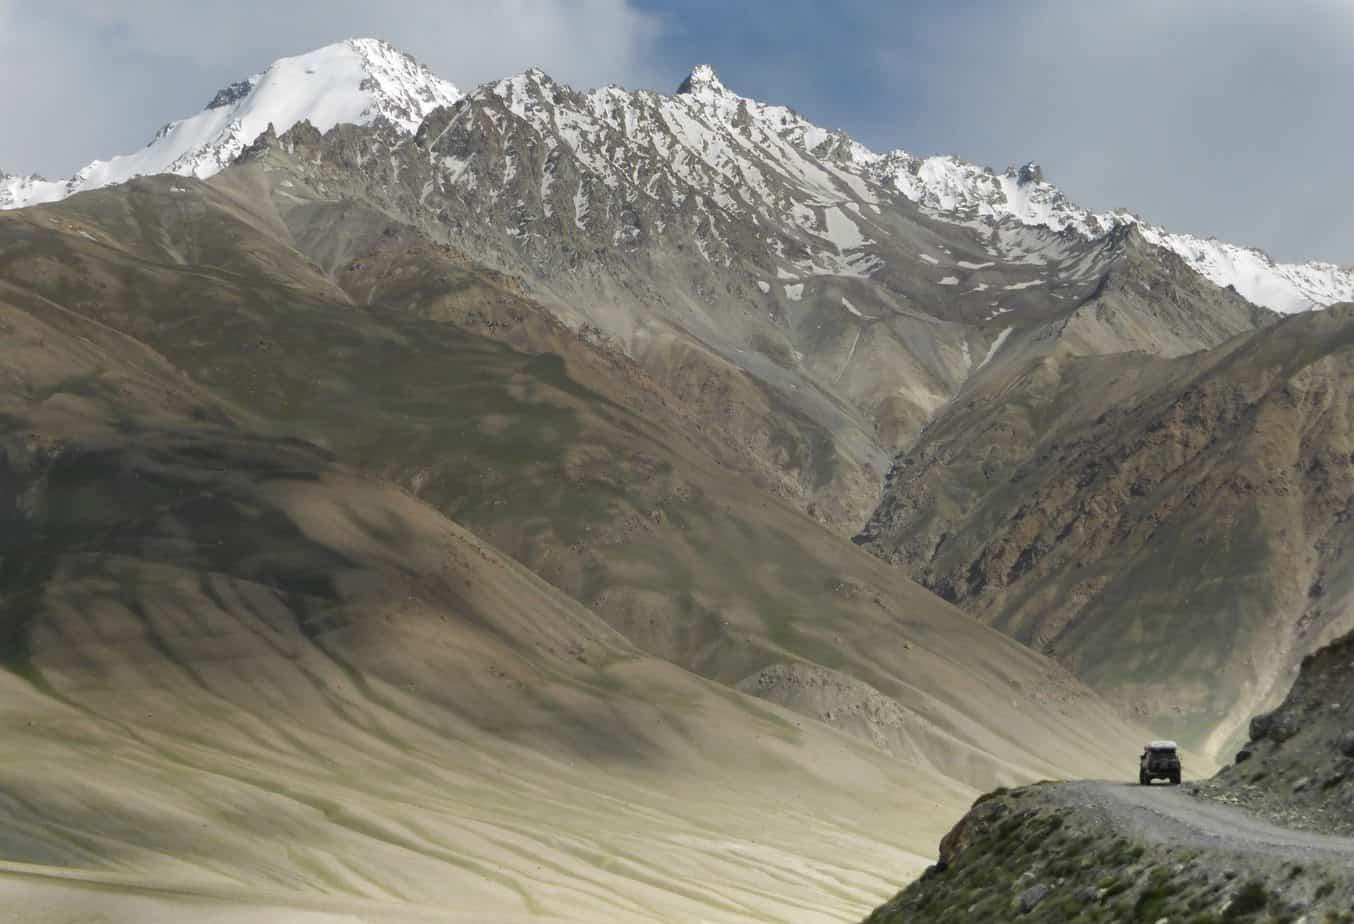 View Across The Hindu Khush Mountains in Pakistan